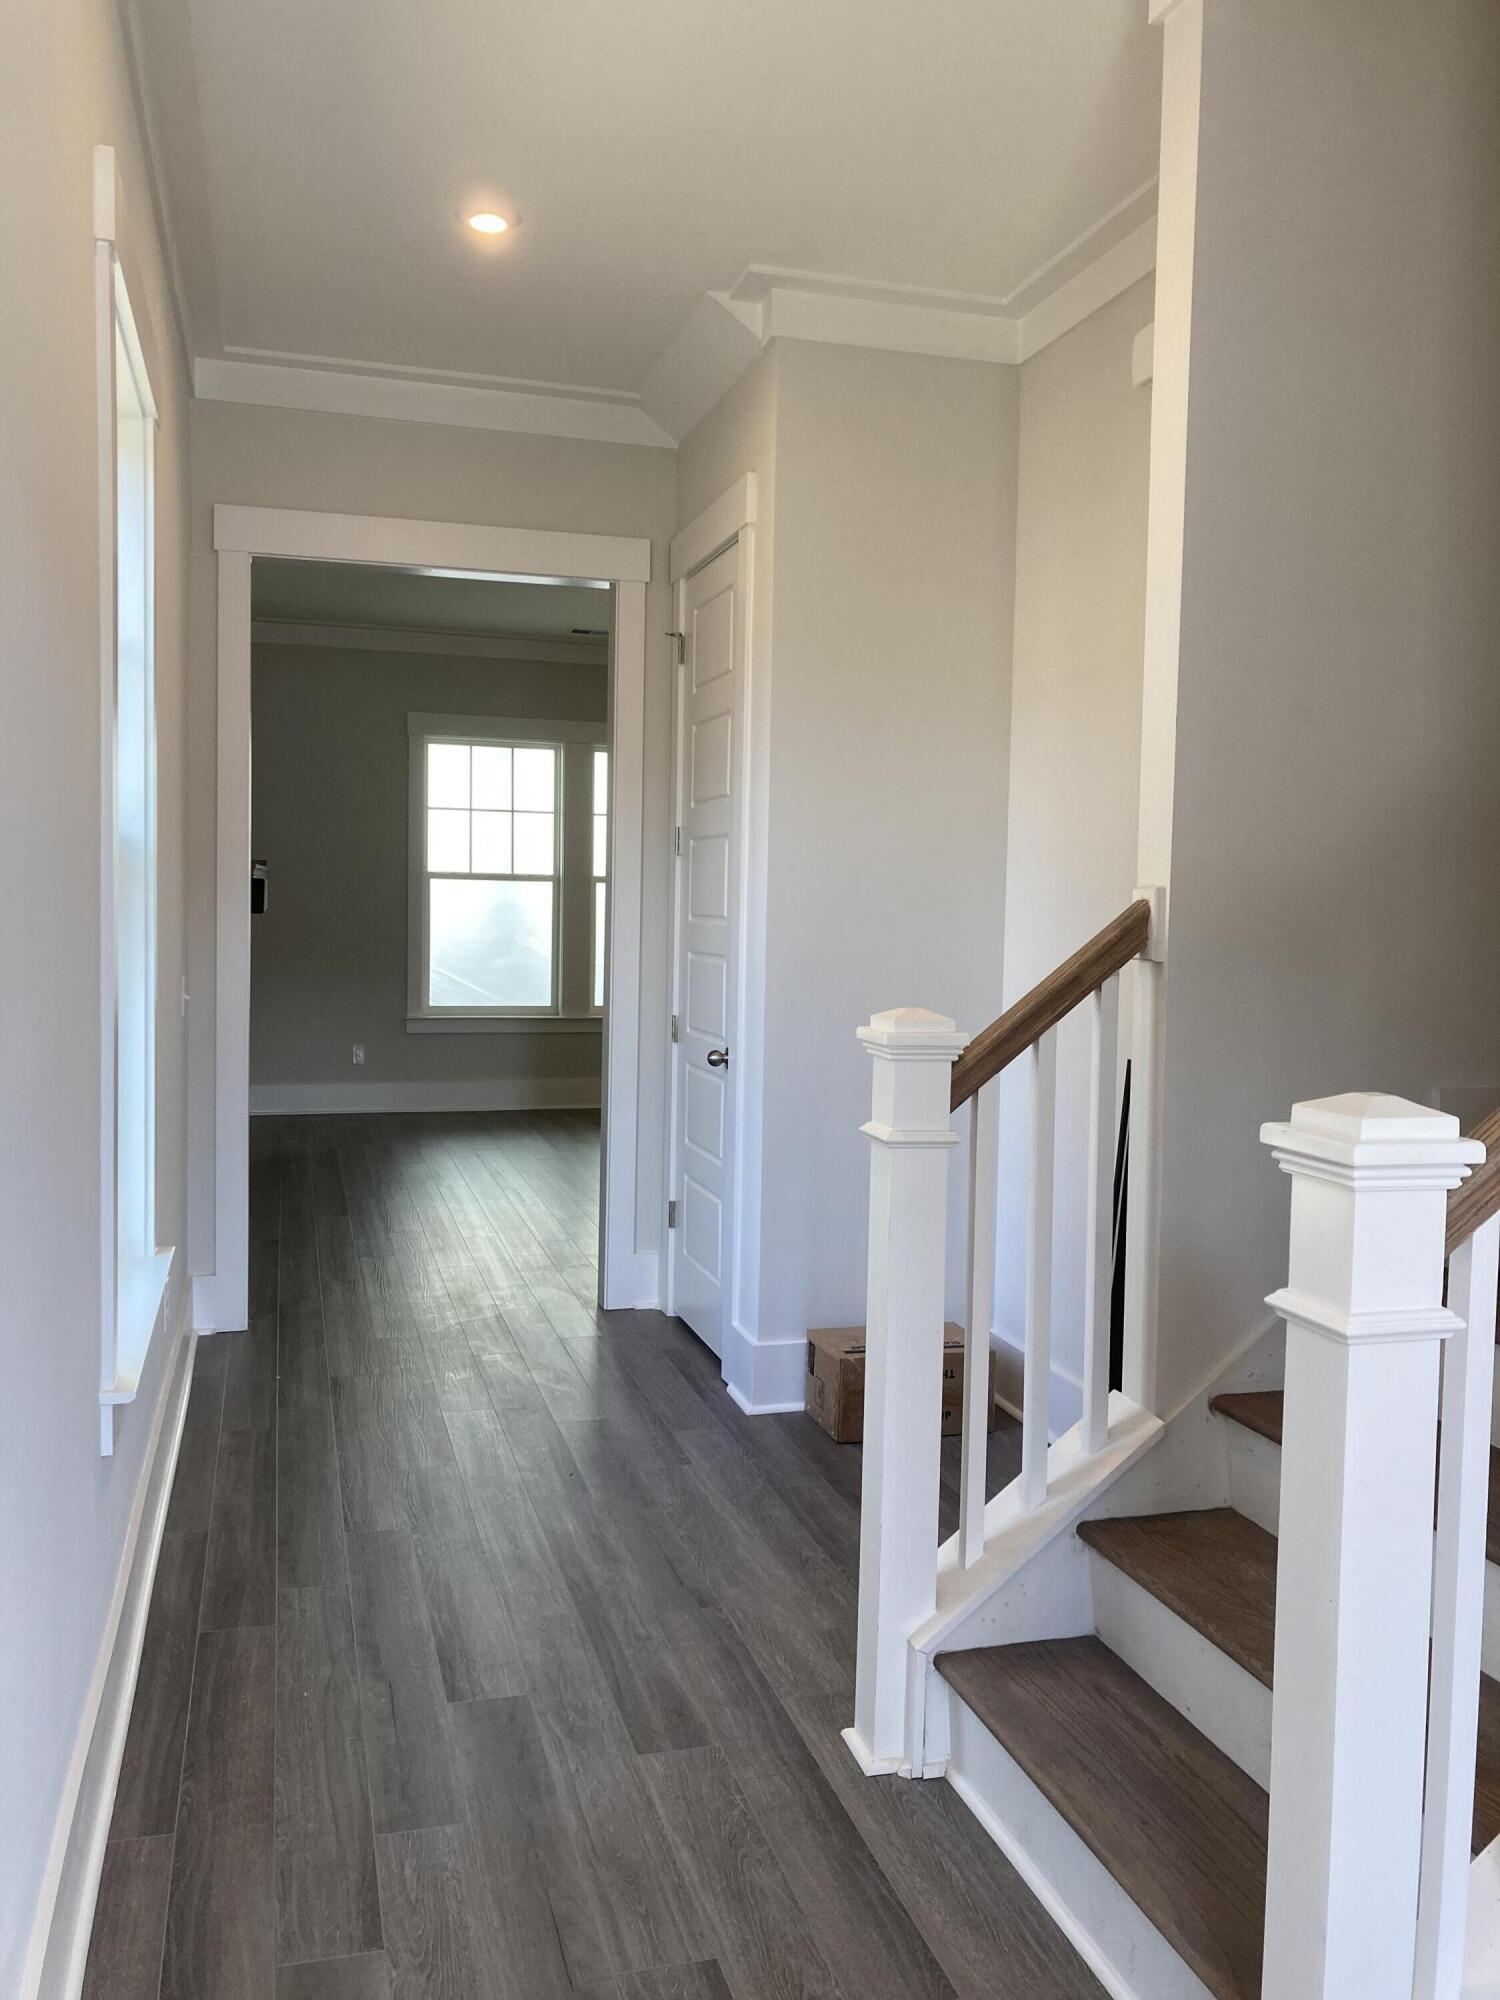 Fulton Park Homes For Sale - 1264 Max, Mount Pleasant, SC - 10